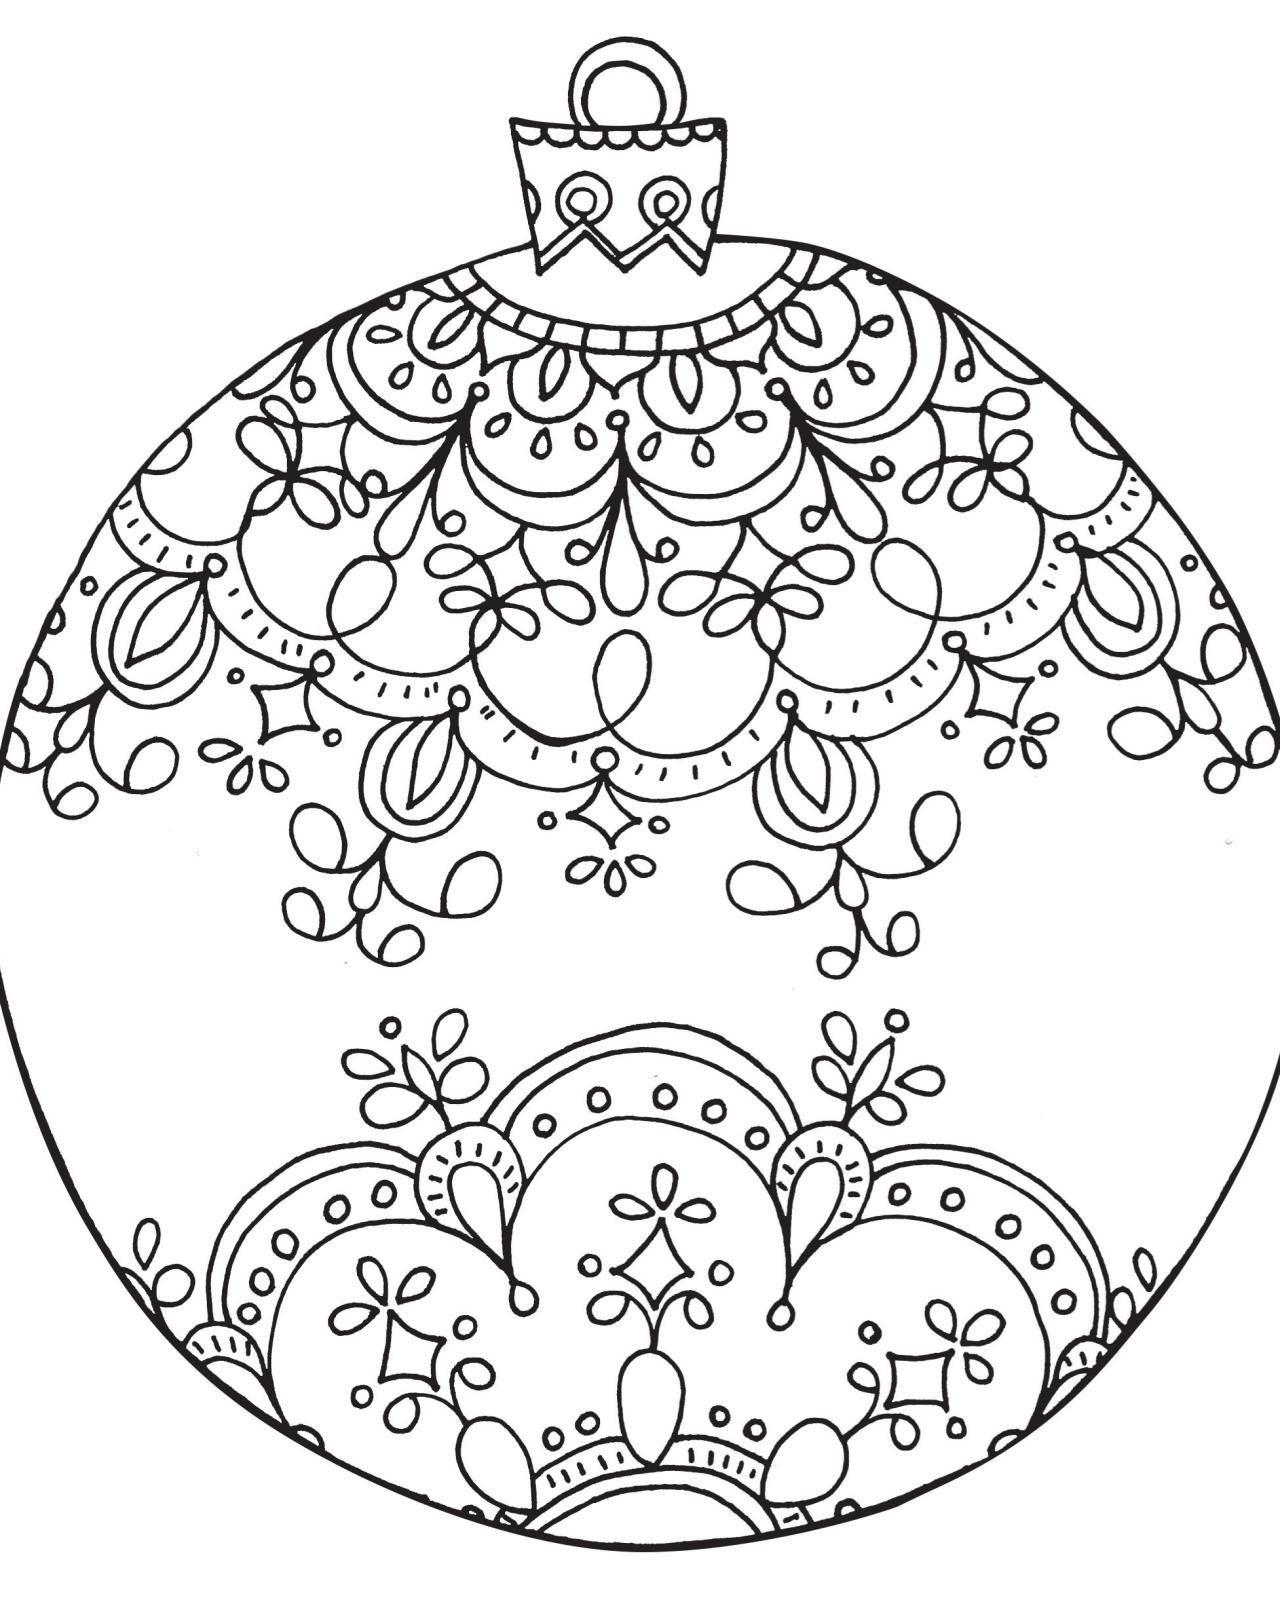 Christmas Mandala Coloring Pages Free Printable Christmas Coloring Pages Christmas Coloring Books Free Christmas Coloring Pages